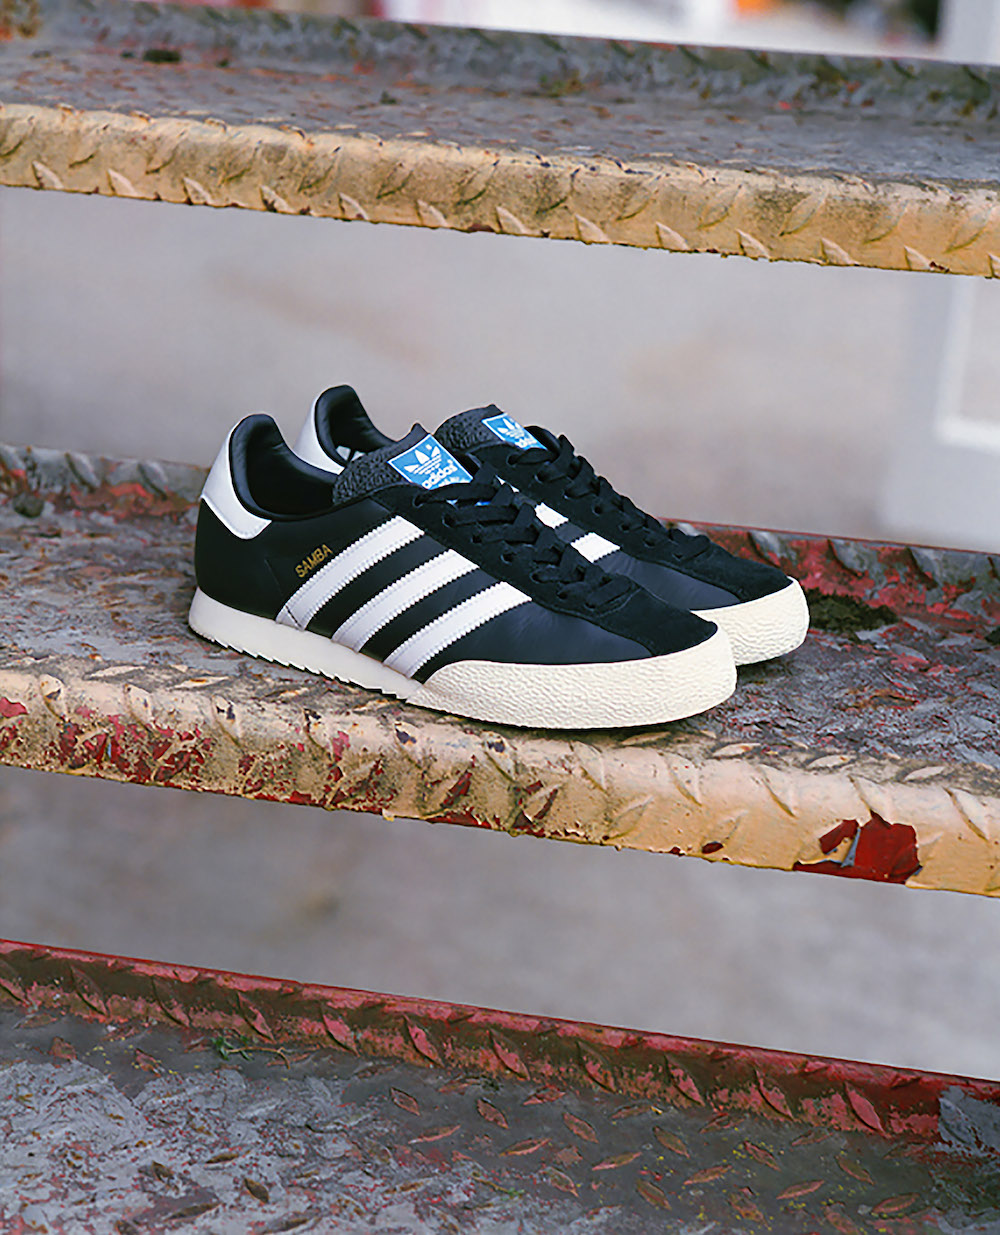 adidas SPZL all hail the Samba! – The